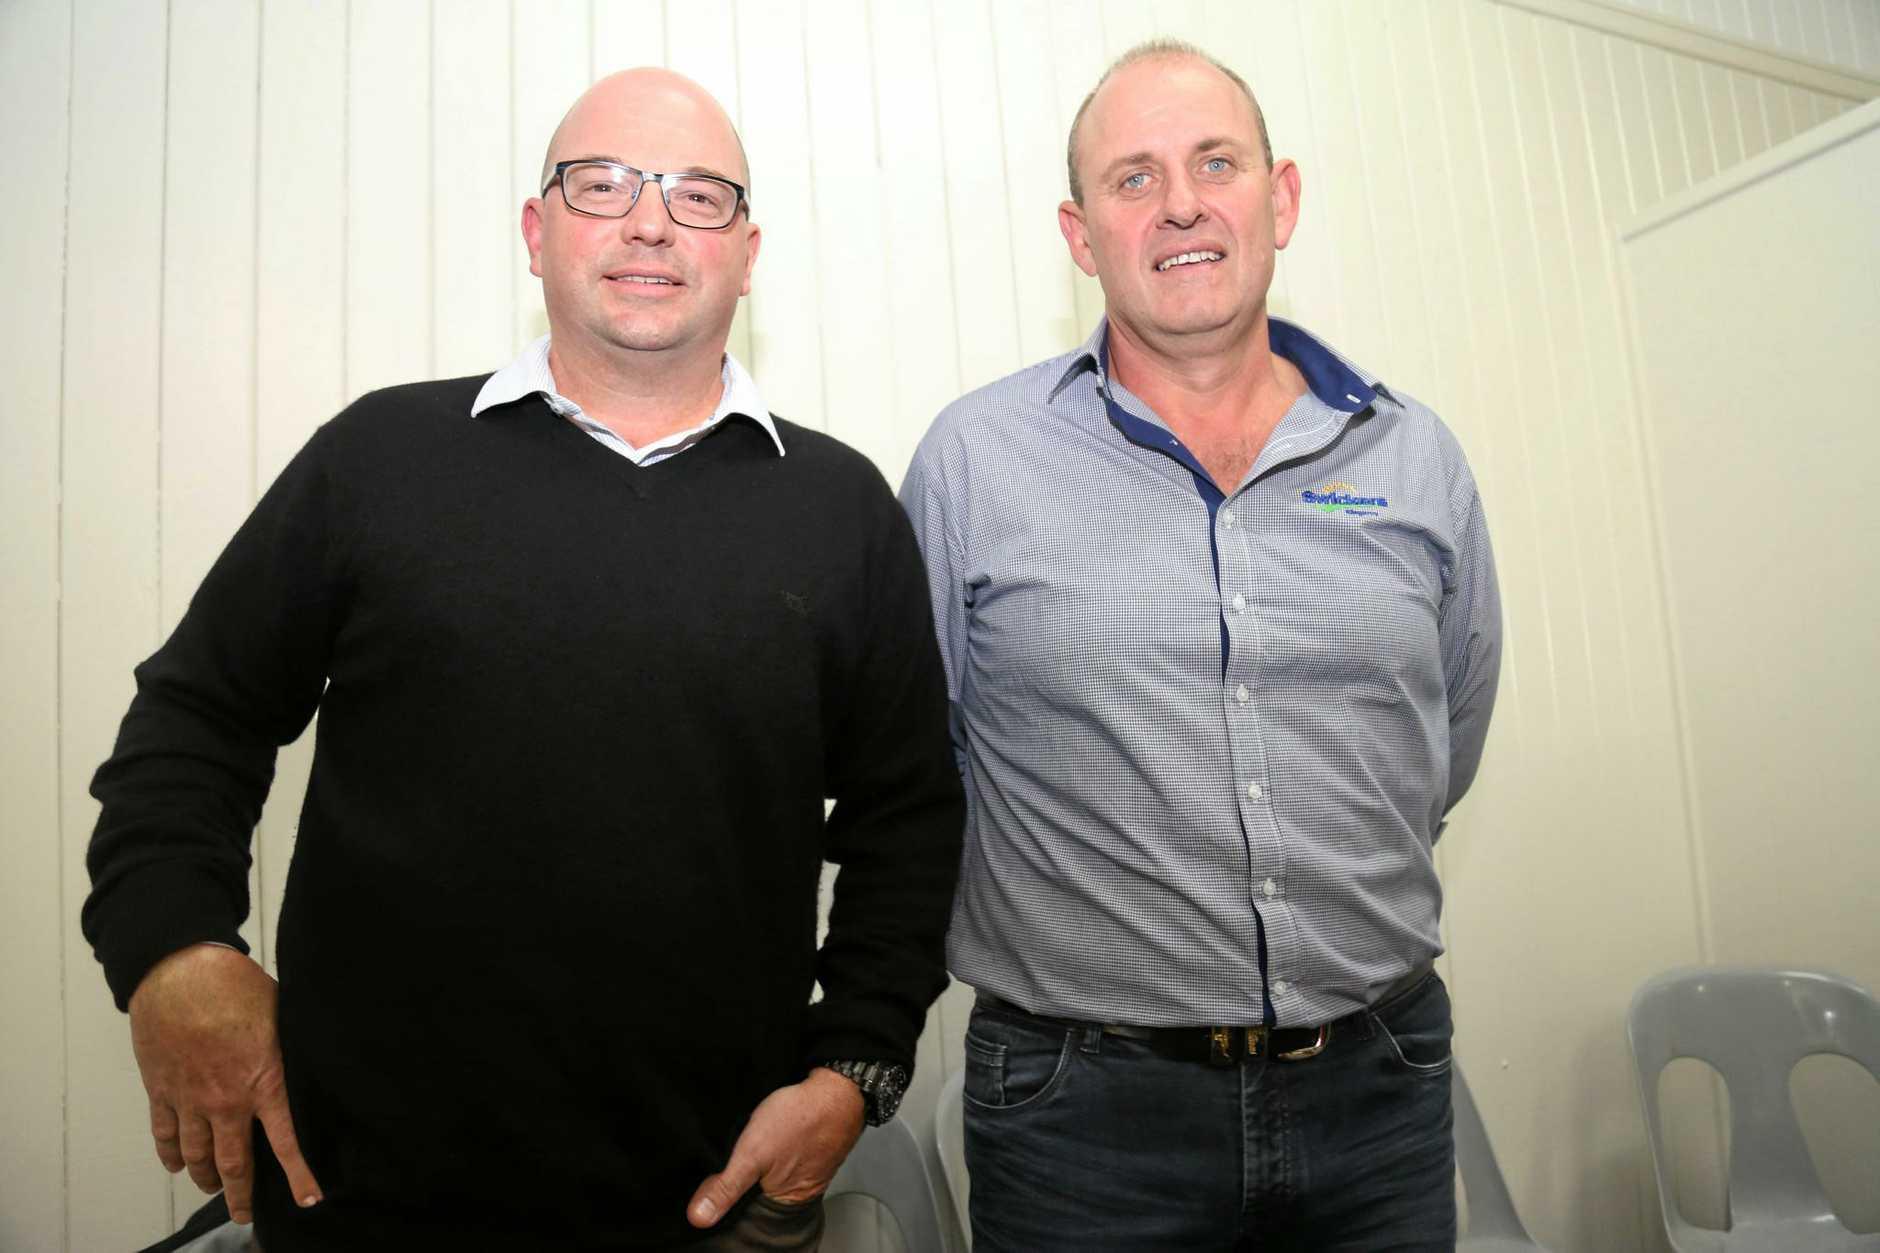 SunPork CEO Rob van Barneveld and Swickers Manager of General Operations Linchon Hawks at the KCCI May Meeting.